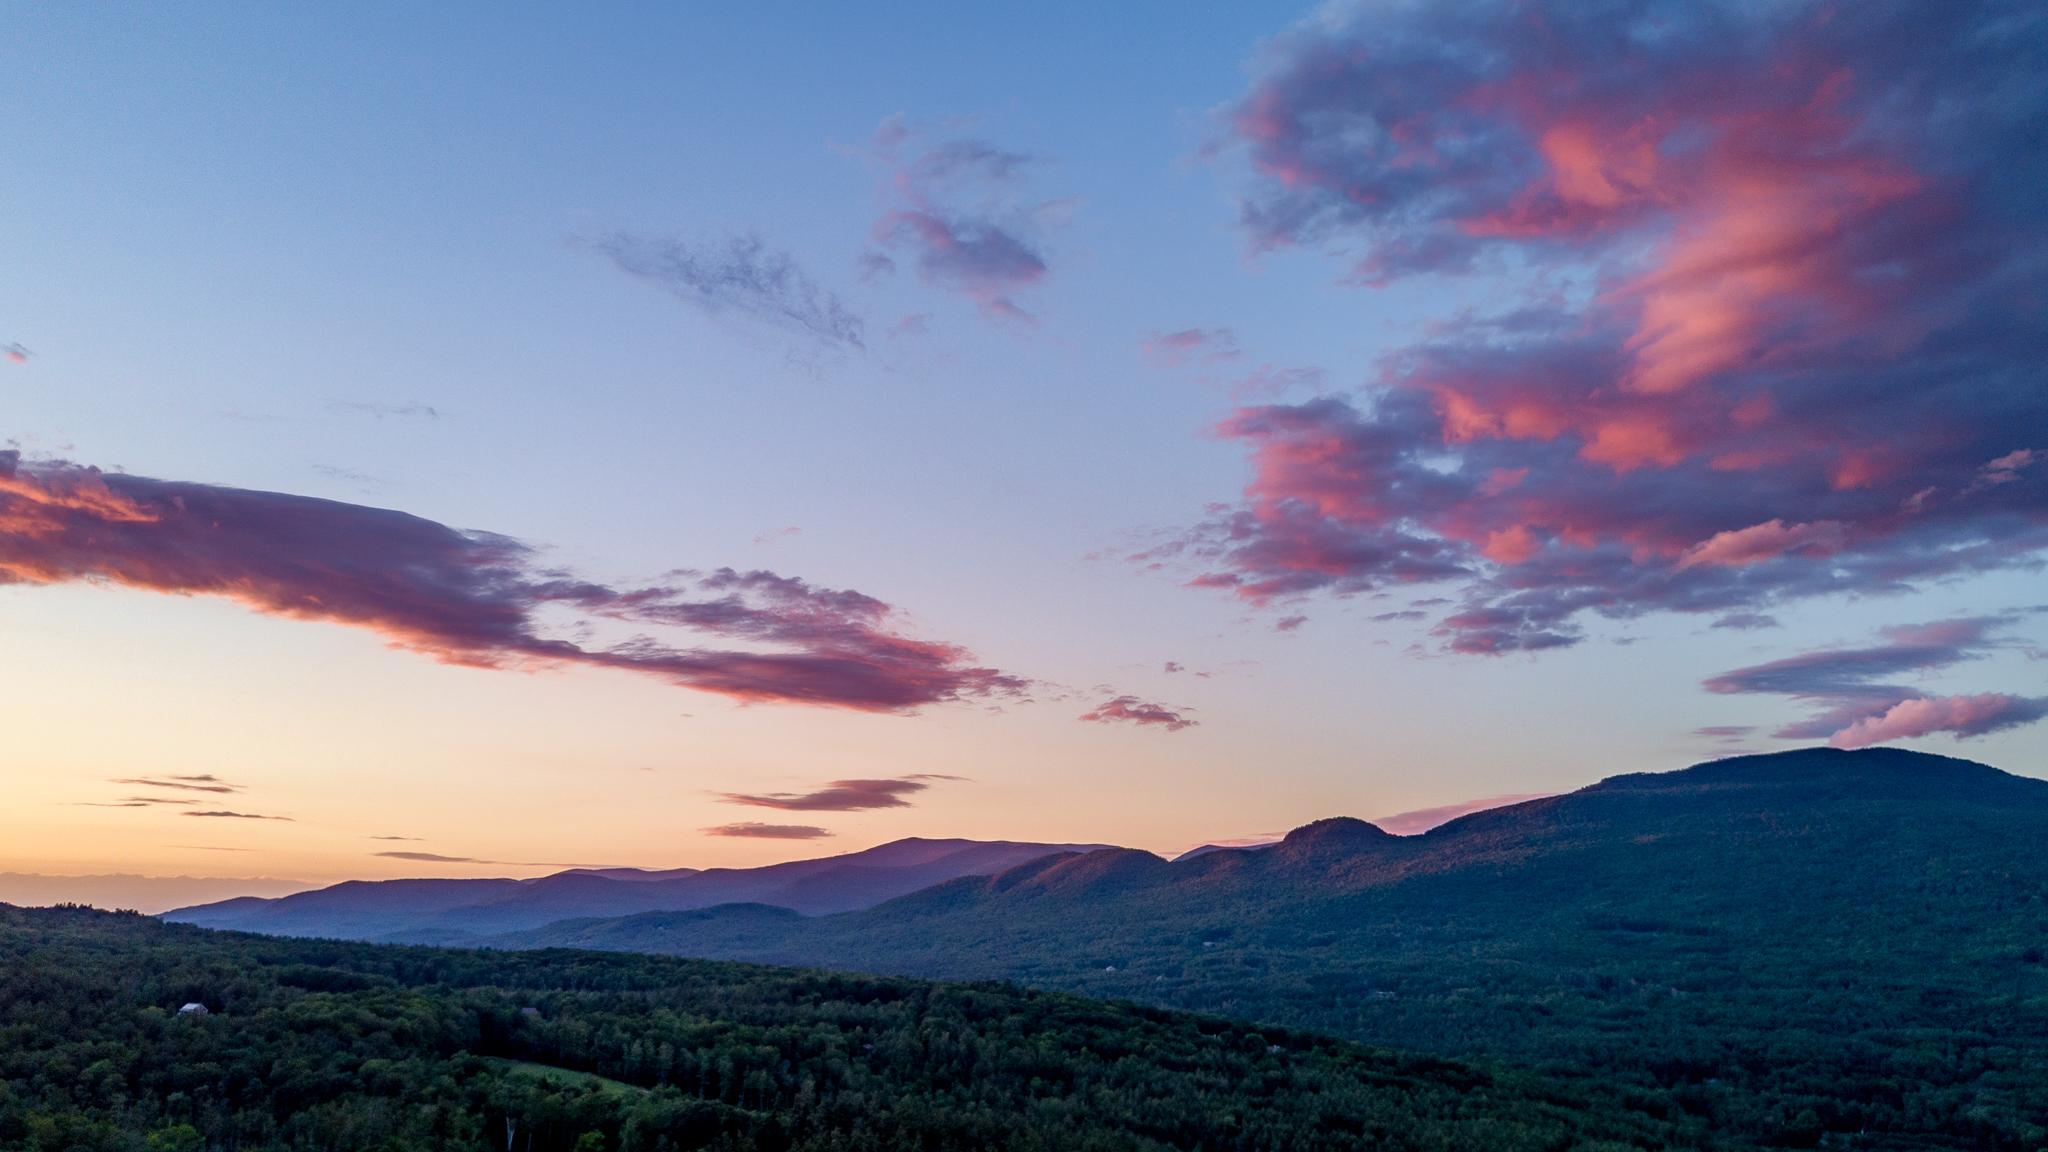 mavic clouds-021-HDR.jpg